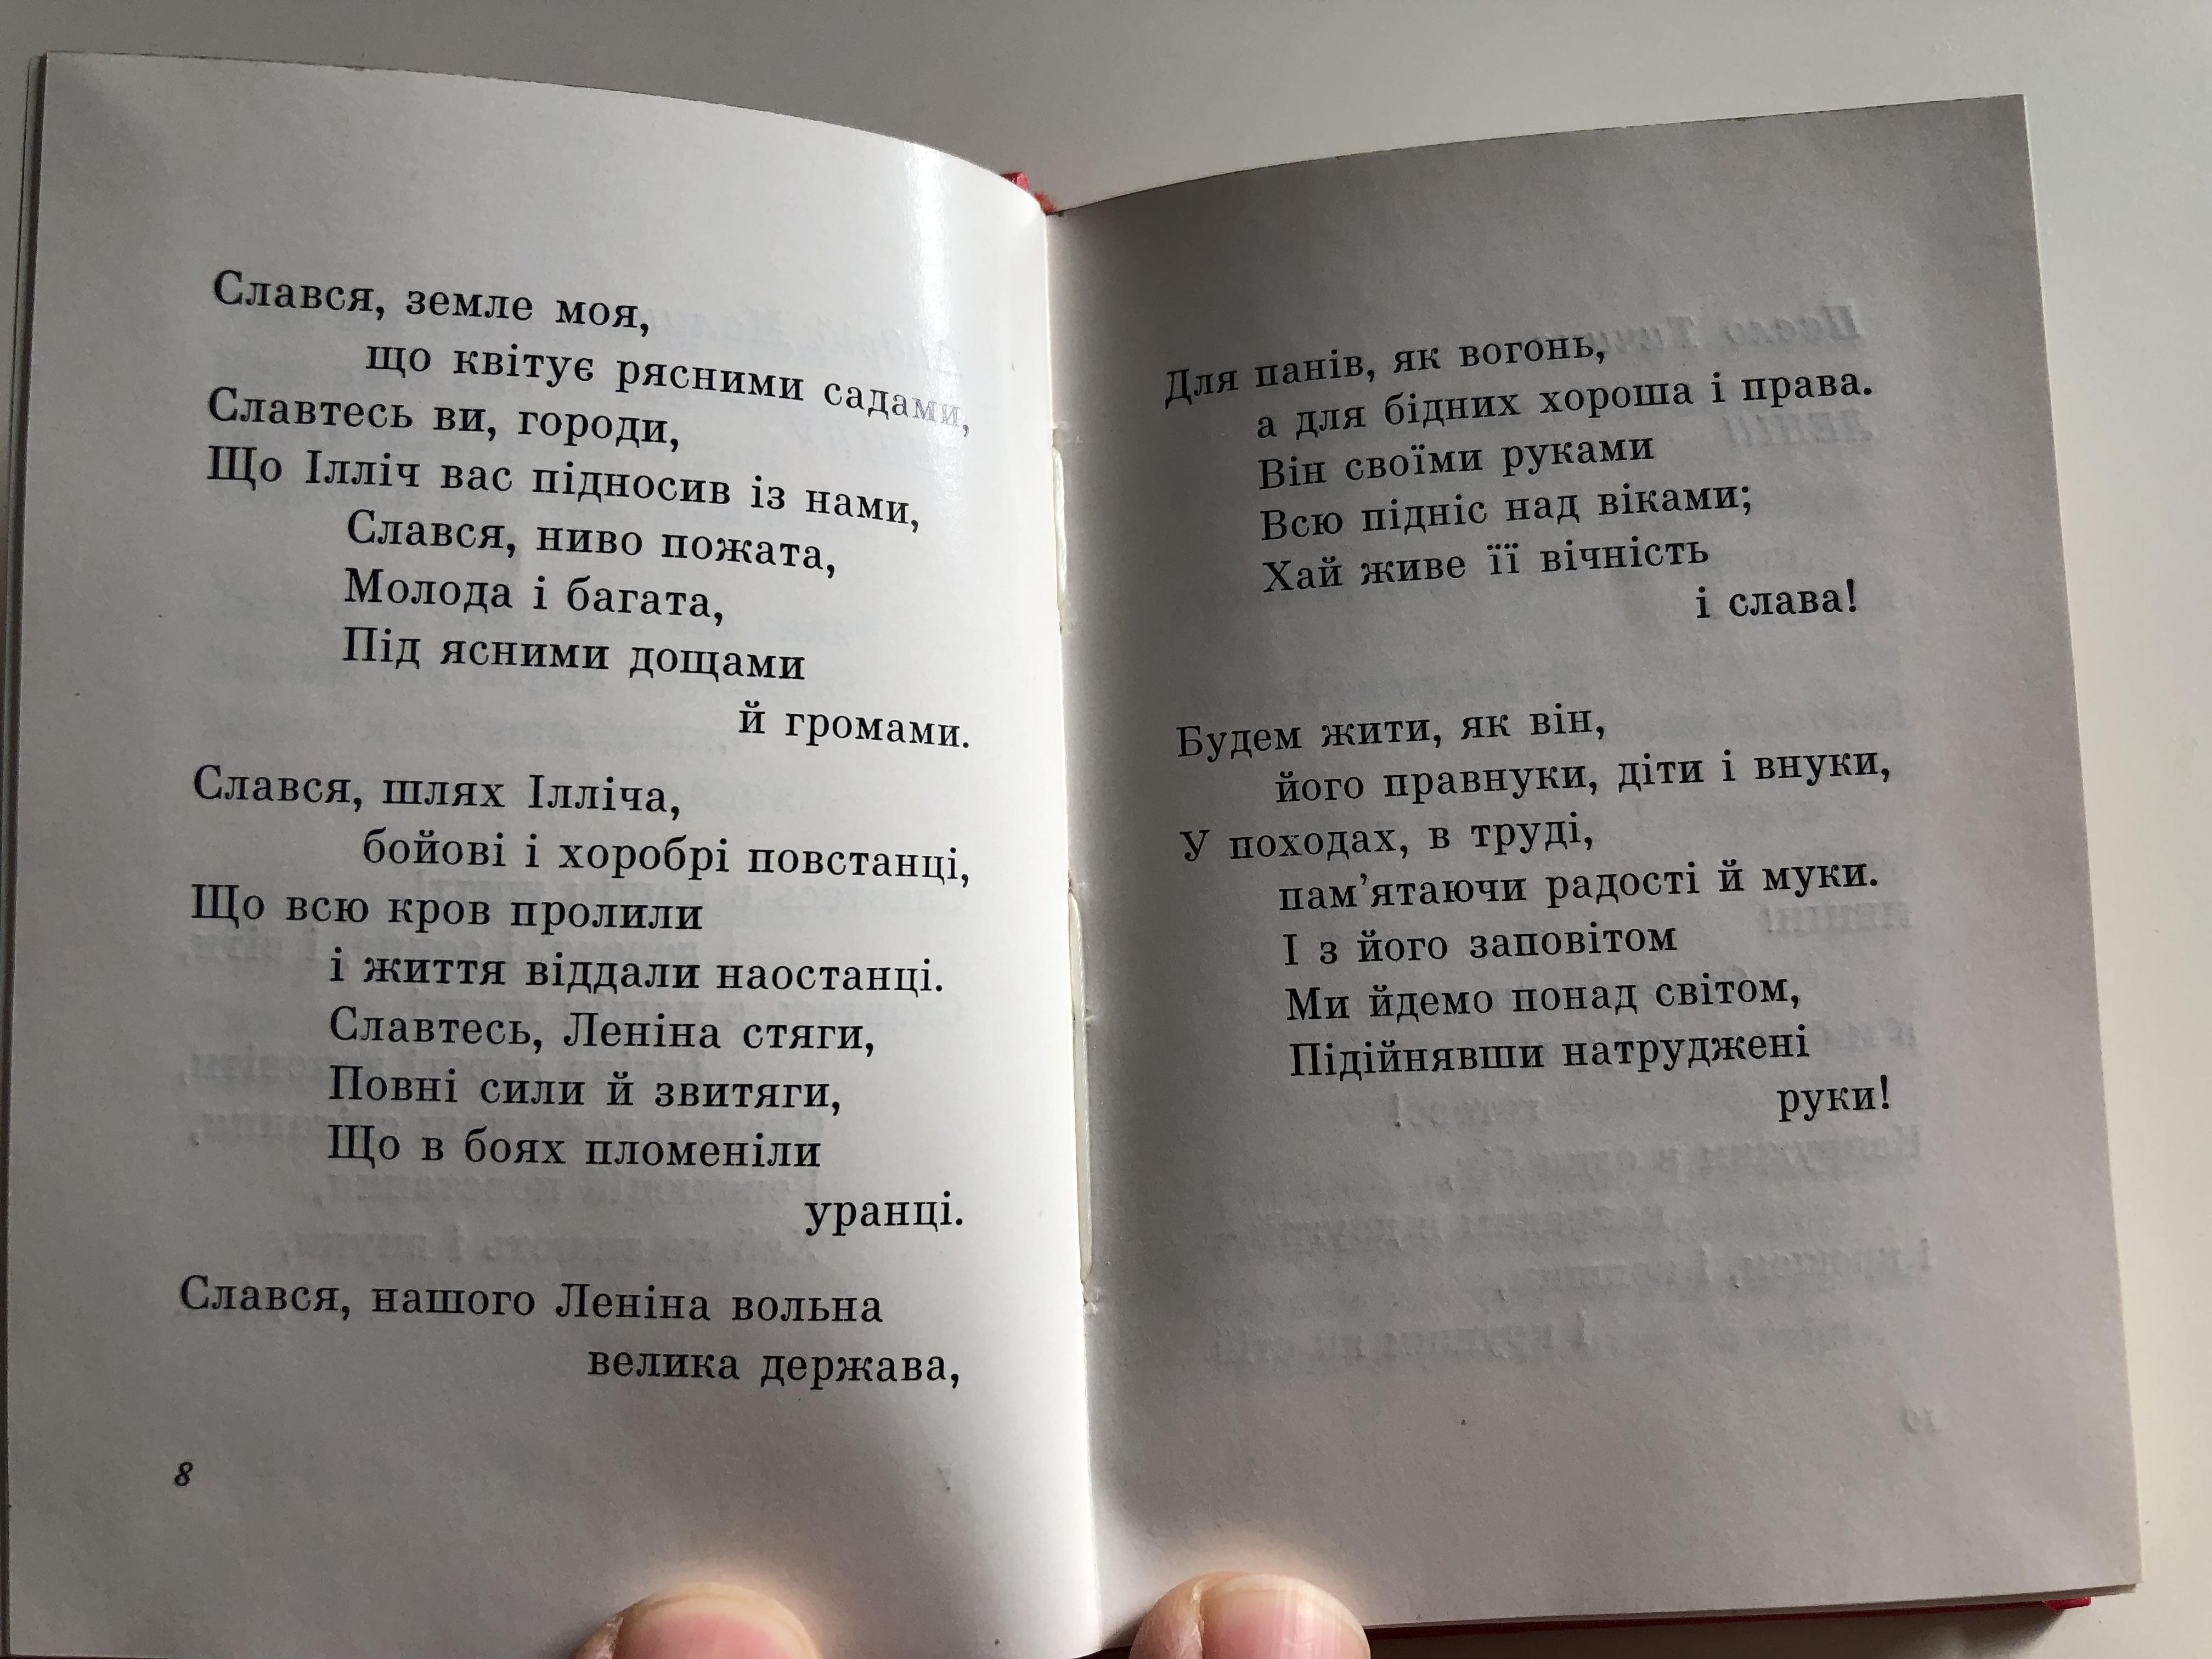 -ukrainian-language-poetry-by-soviet-authors-dedicated-to-lenin-hardcover-golden-edges-pocket-size-i-1975-6-.jpg